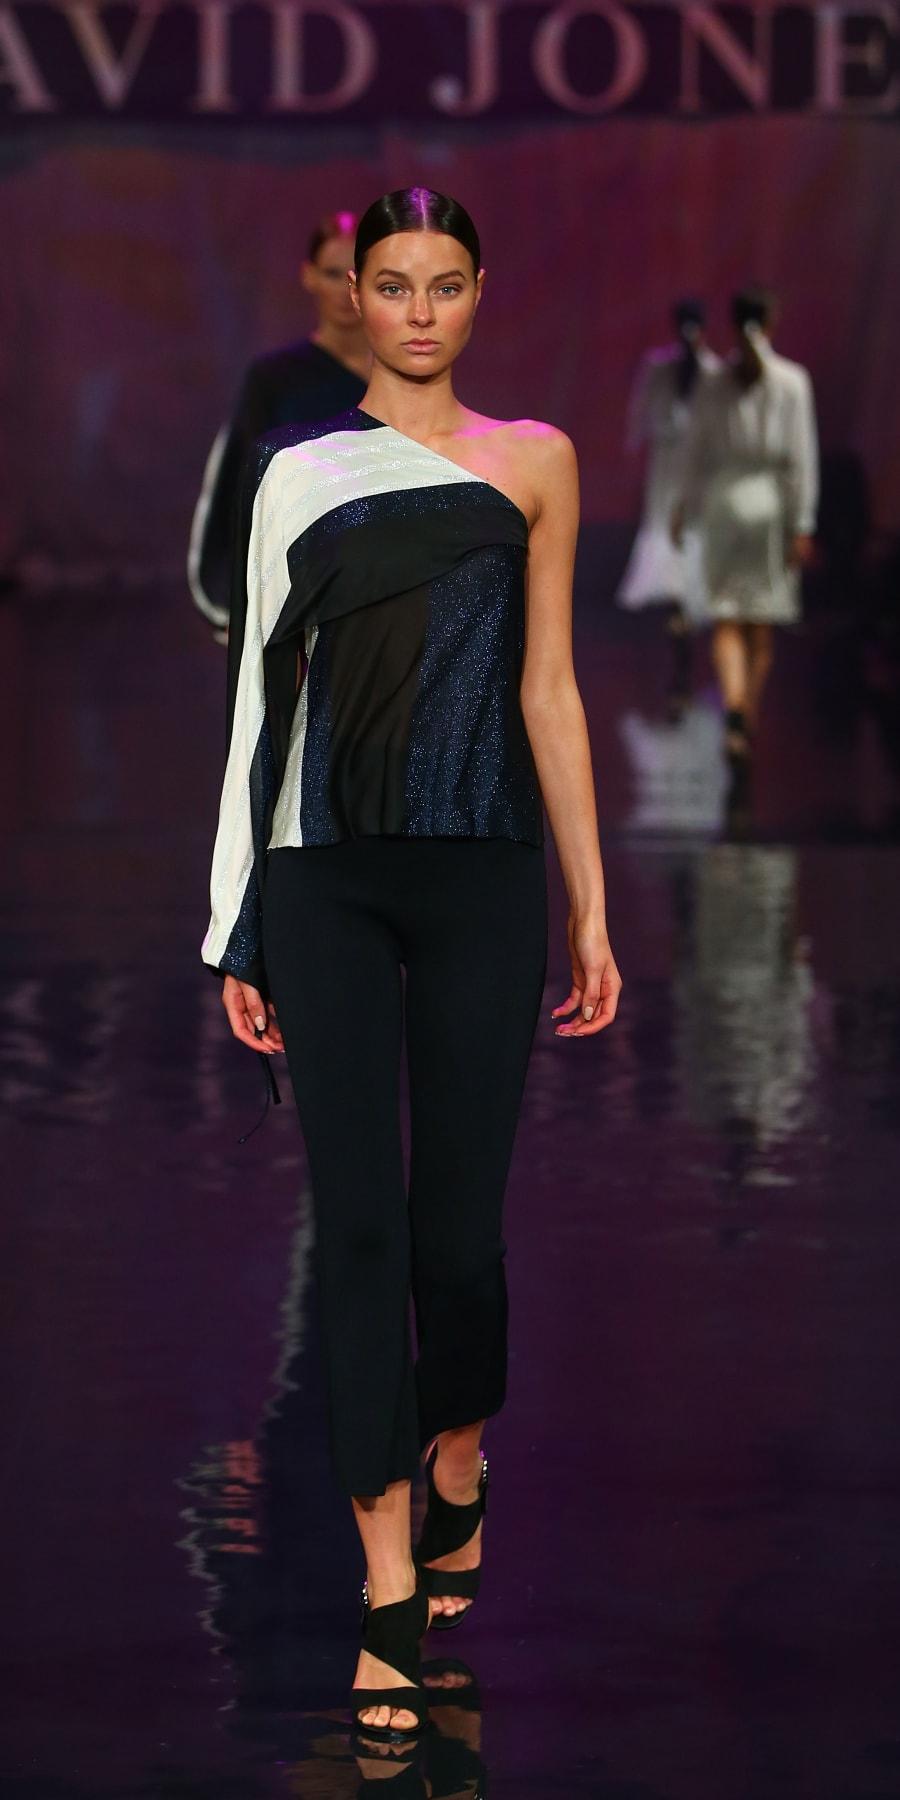 A model showcases designs by Scanlan